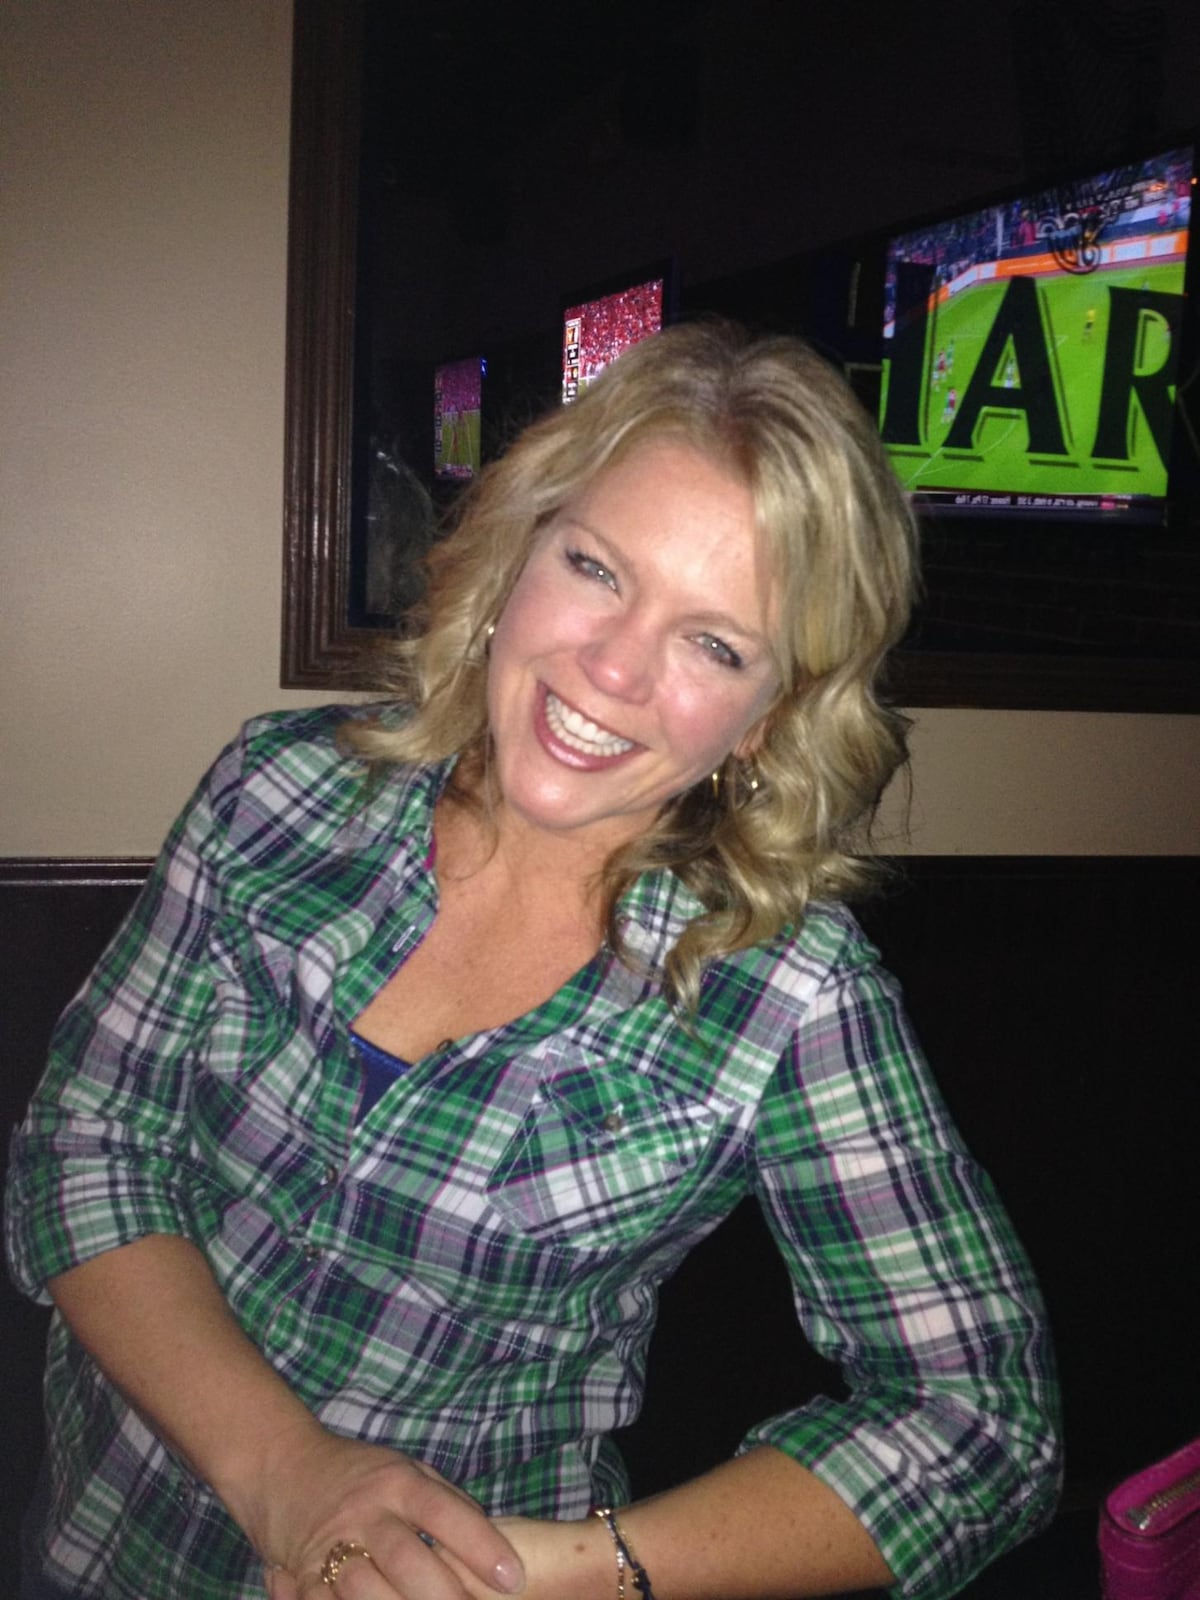 Heather from Siesta Key